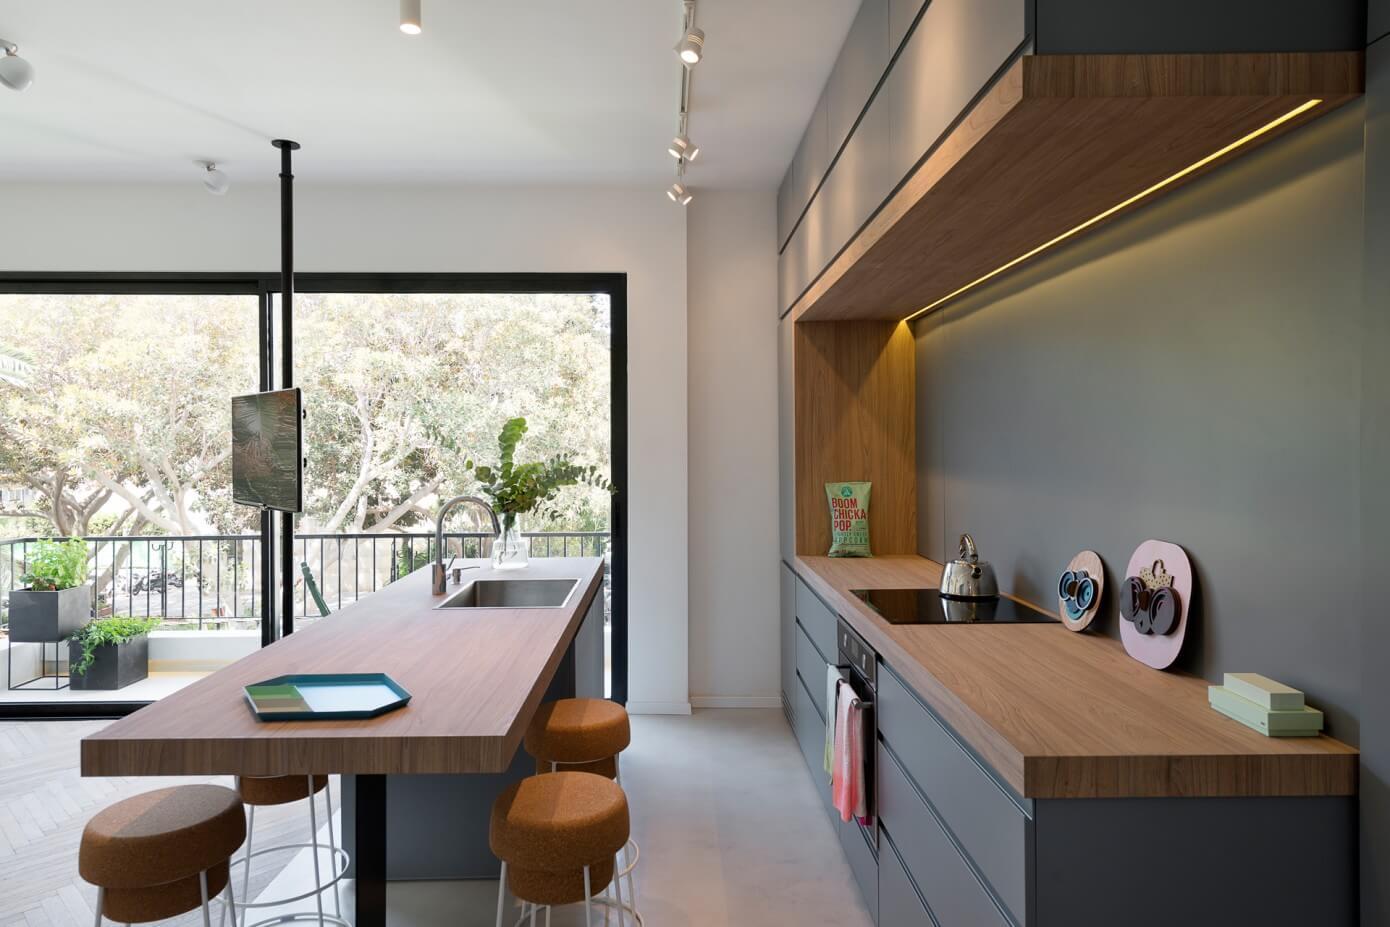 003 apartment tel aviv maayan zusman interior design homeadore - Outs studio keuken ...